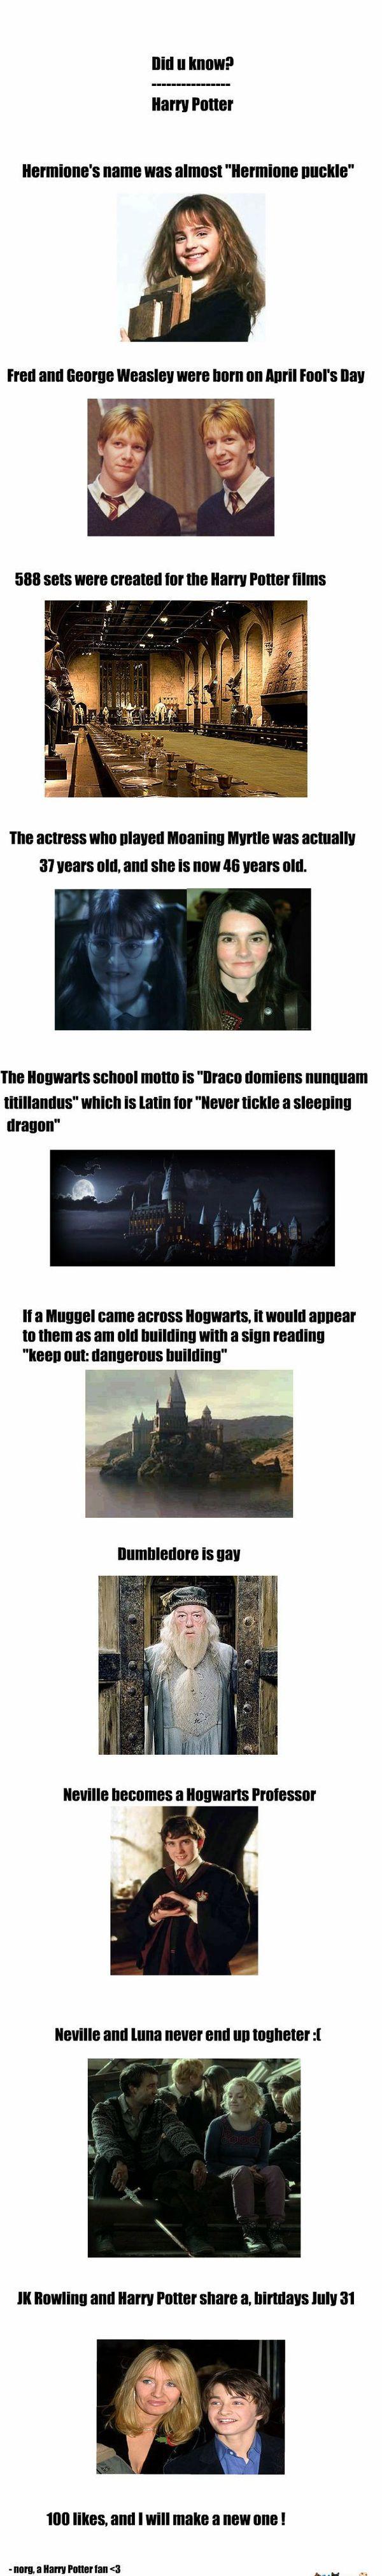 Did U Know? Harry Potter